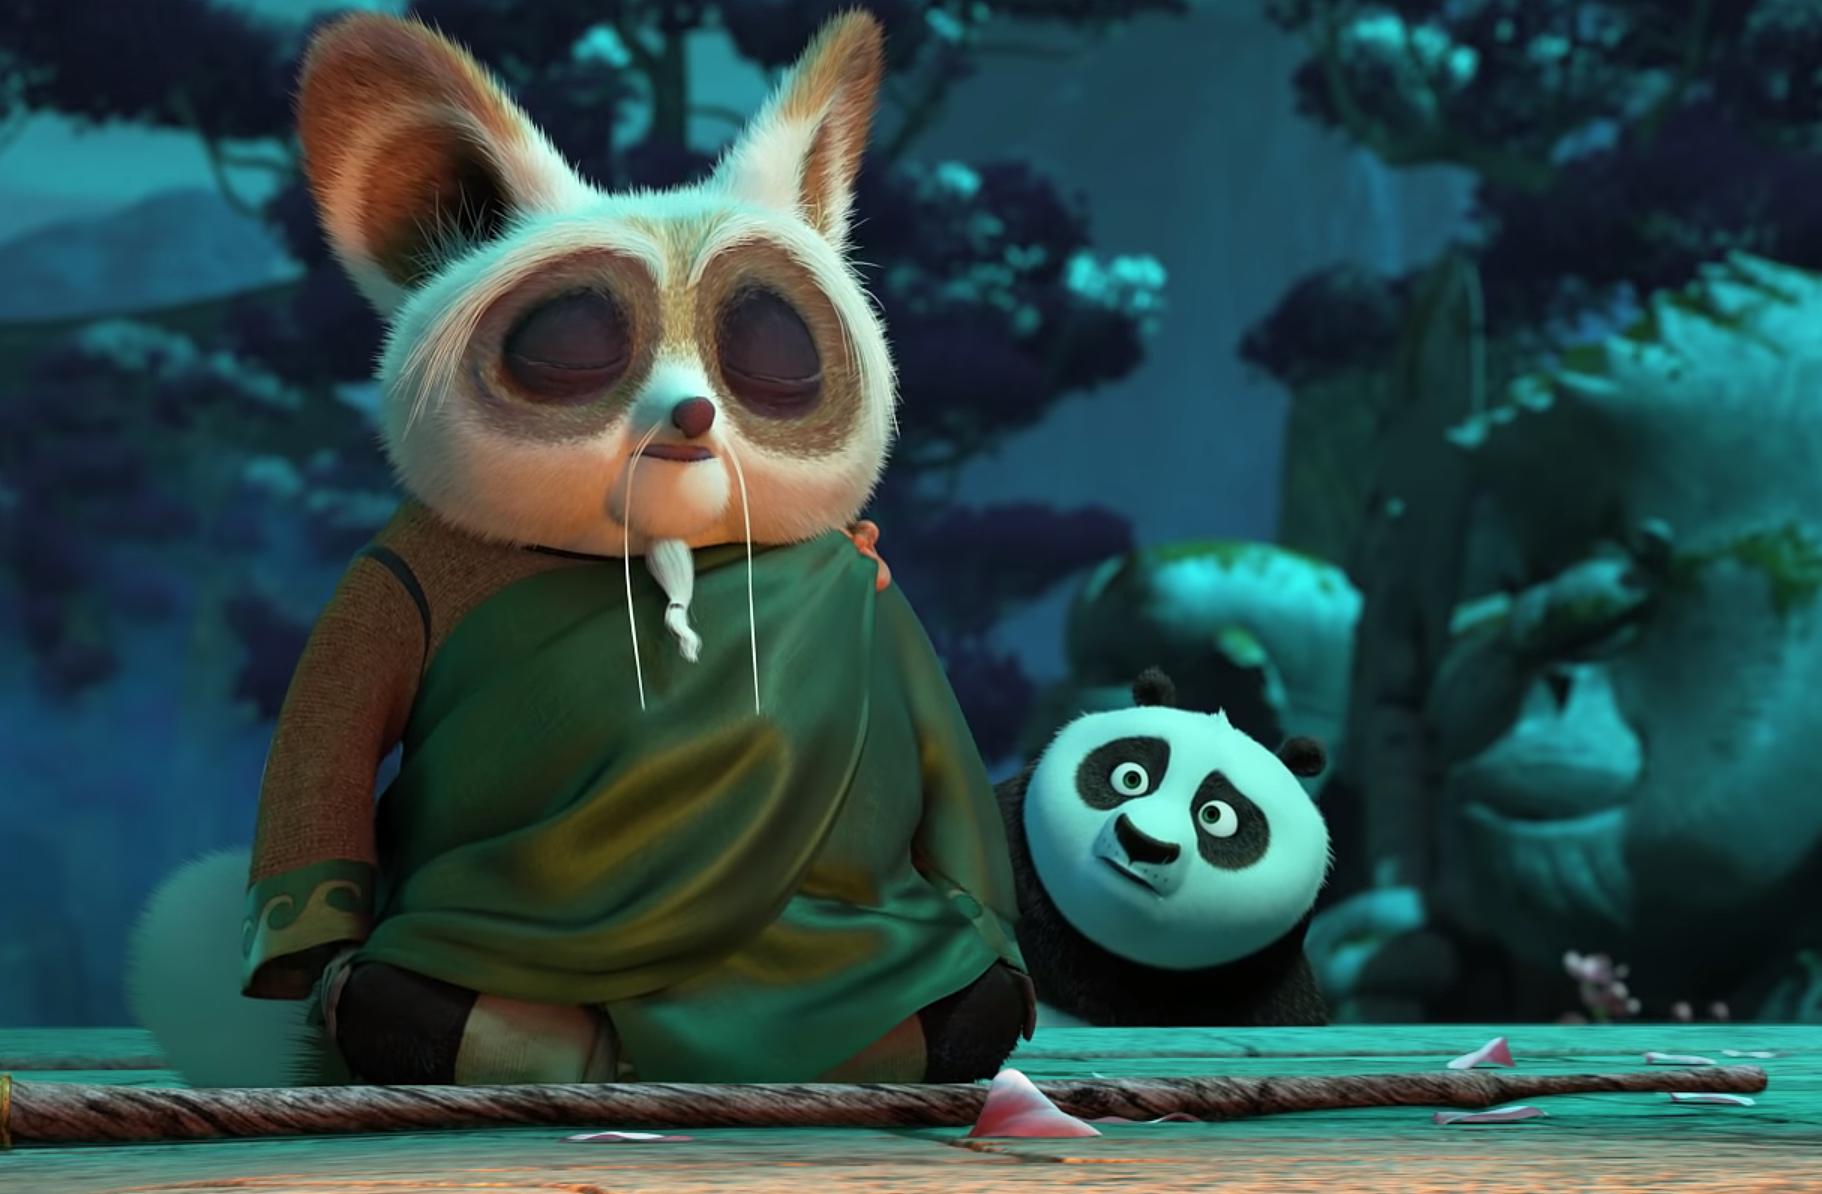 Free Full Cartoon Movies kung fu panda 3 debuts hosts free movie night friday